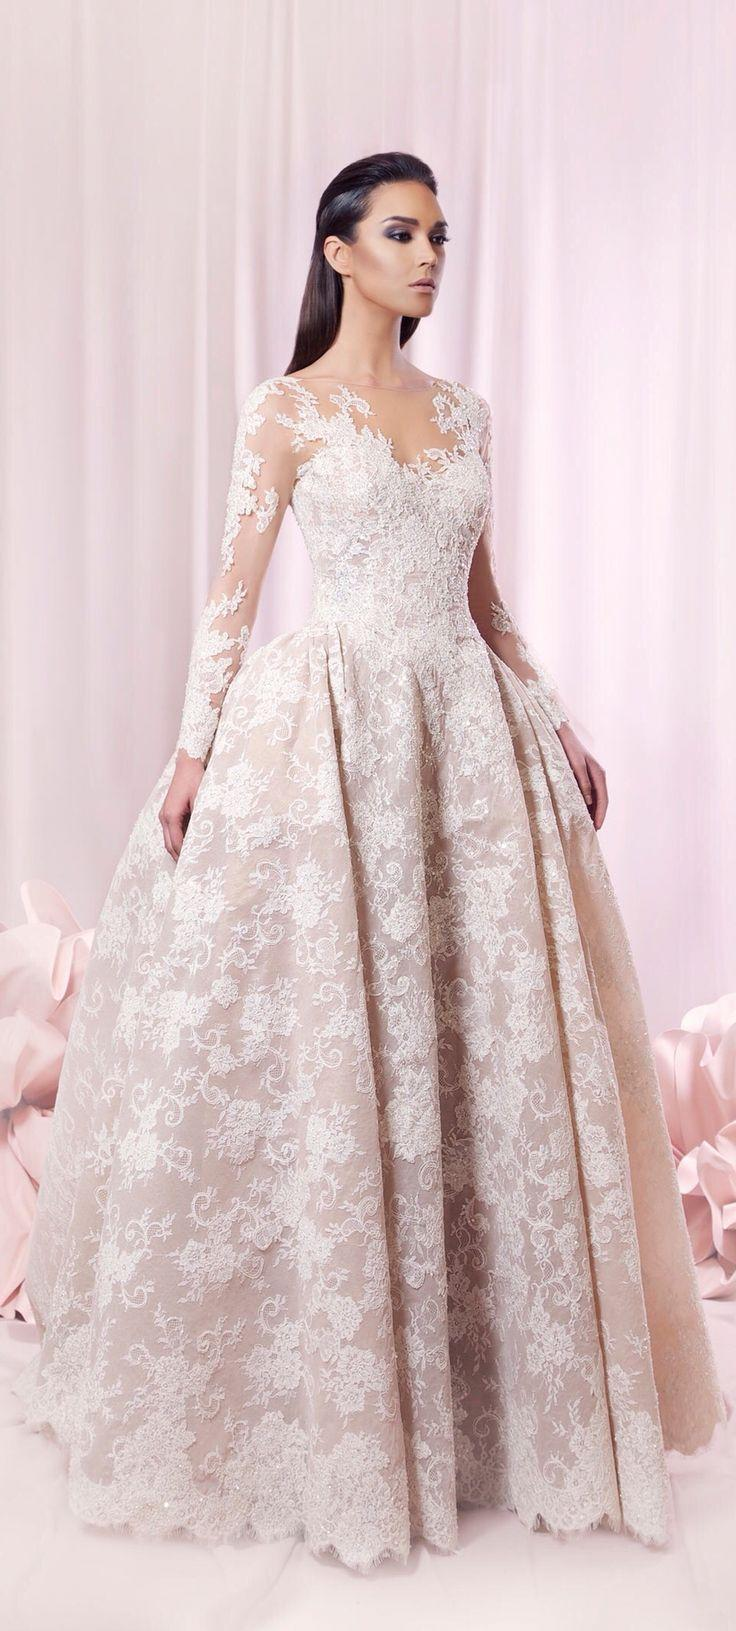 Blush colored tarek sinno haute couture bridal dresses for Blush wedding dress for sale